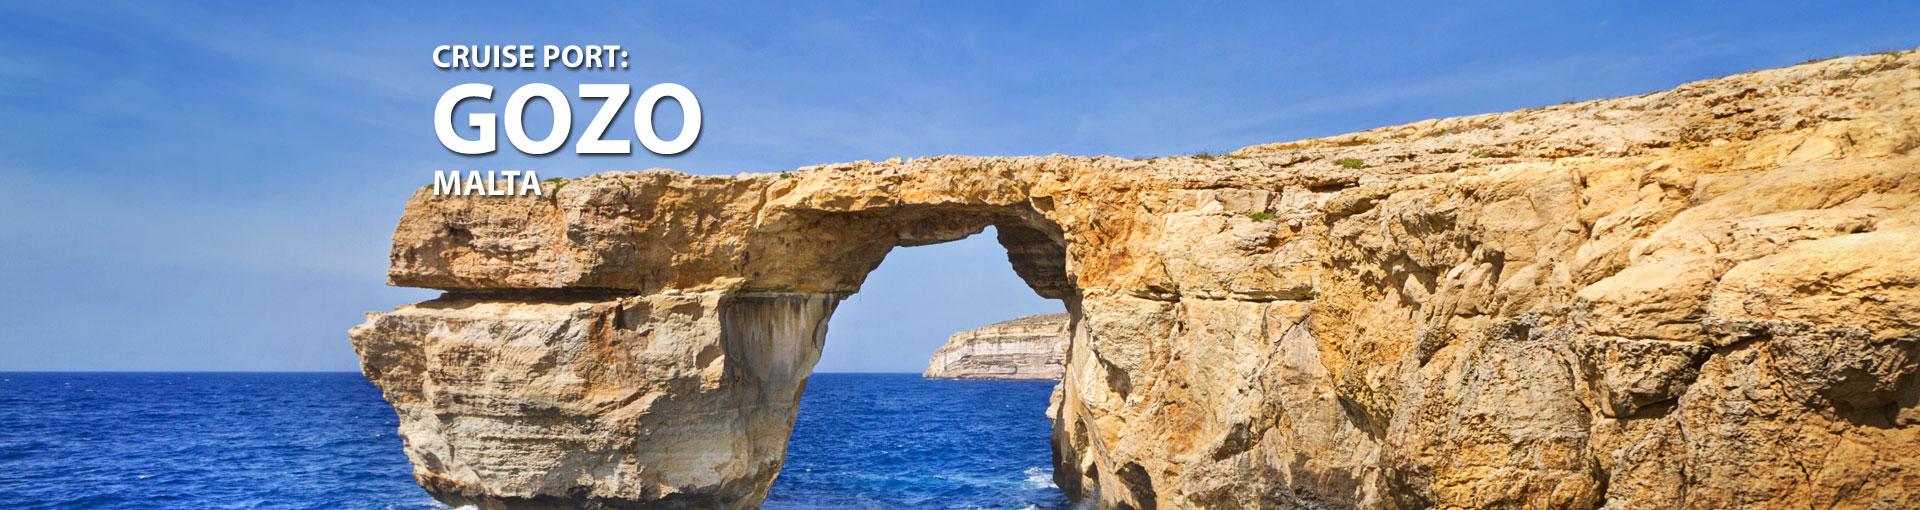 Cruises to Gozo, Malta